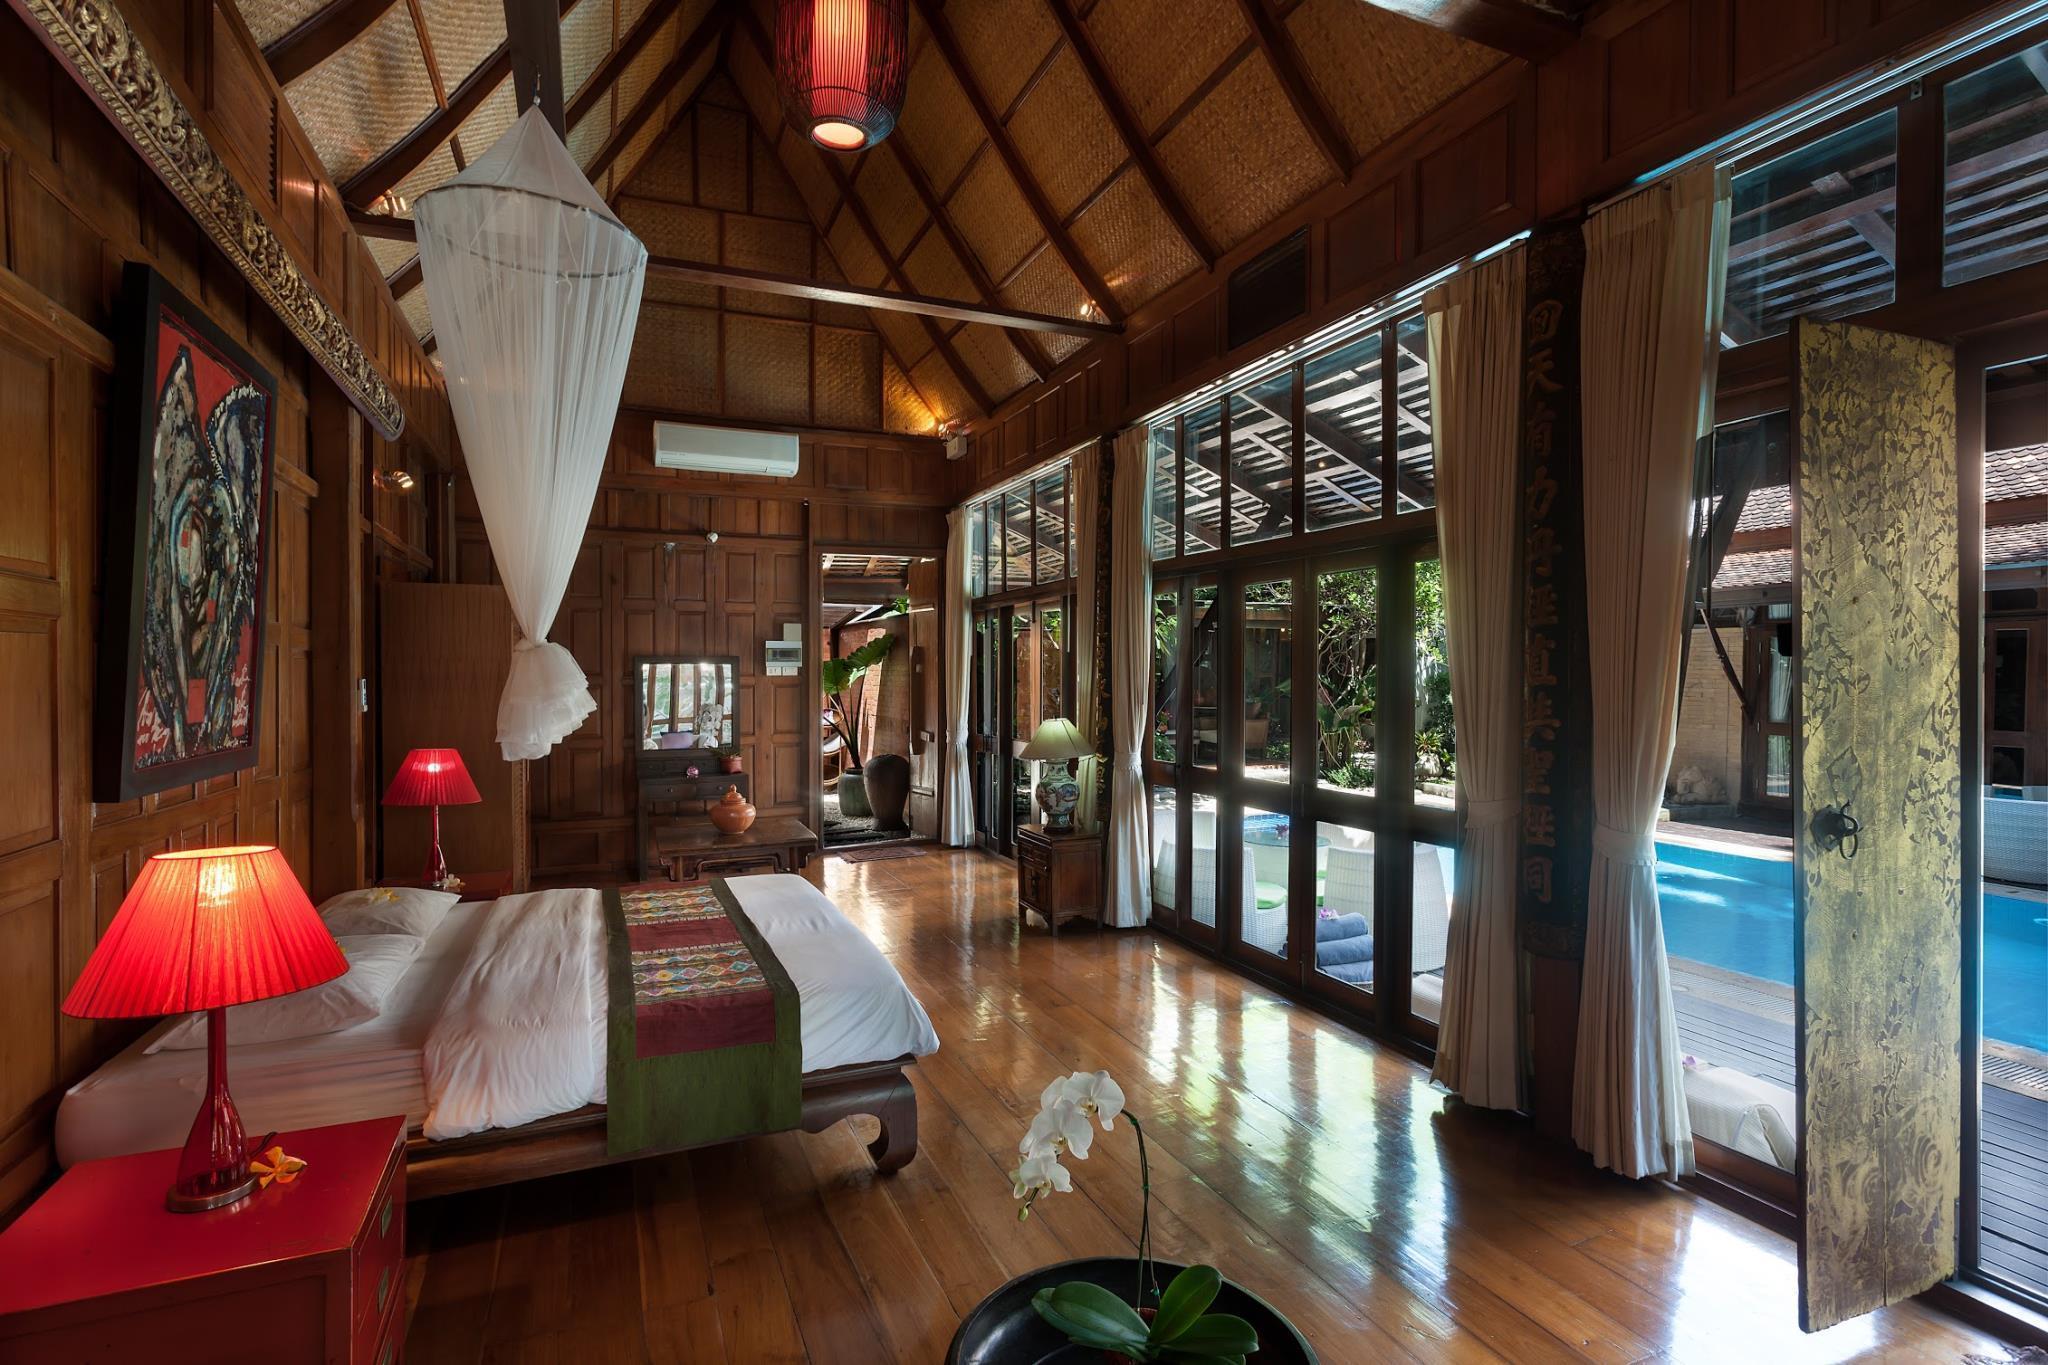 Chiang Mai Luxury Villa,เชียงใหม่ ลักซัวรี วิลลา